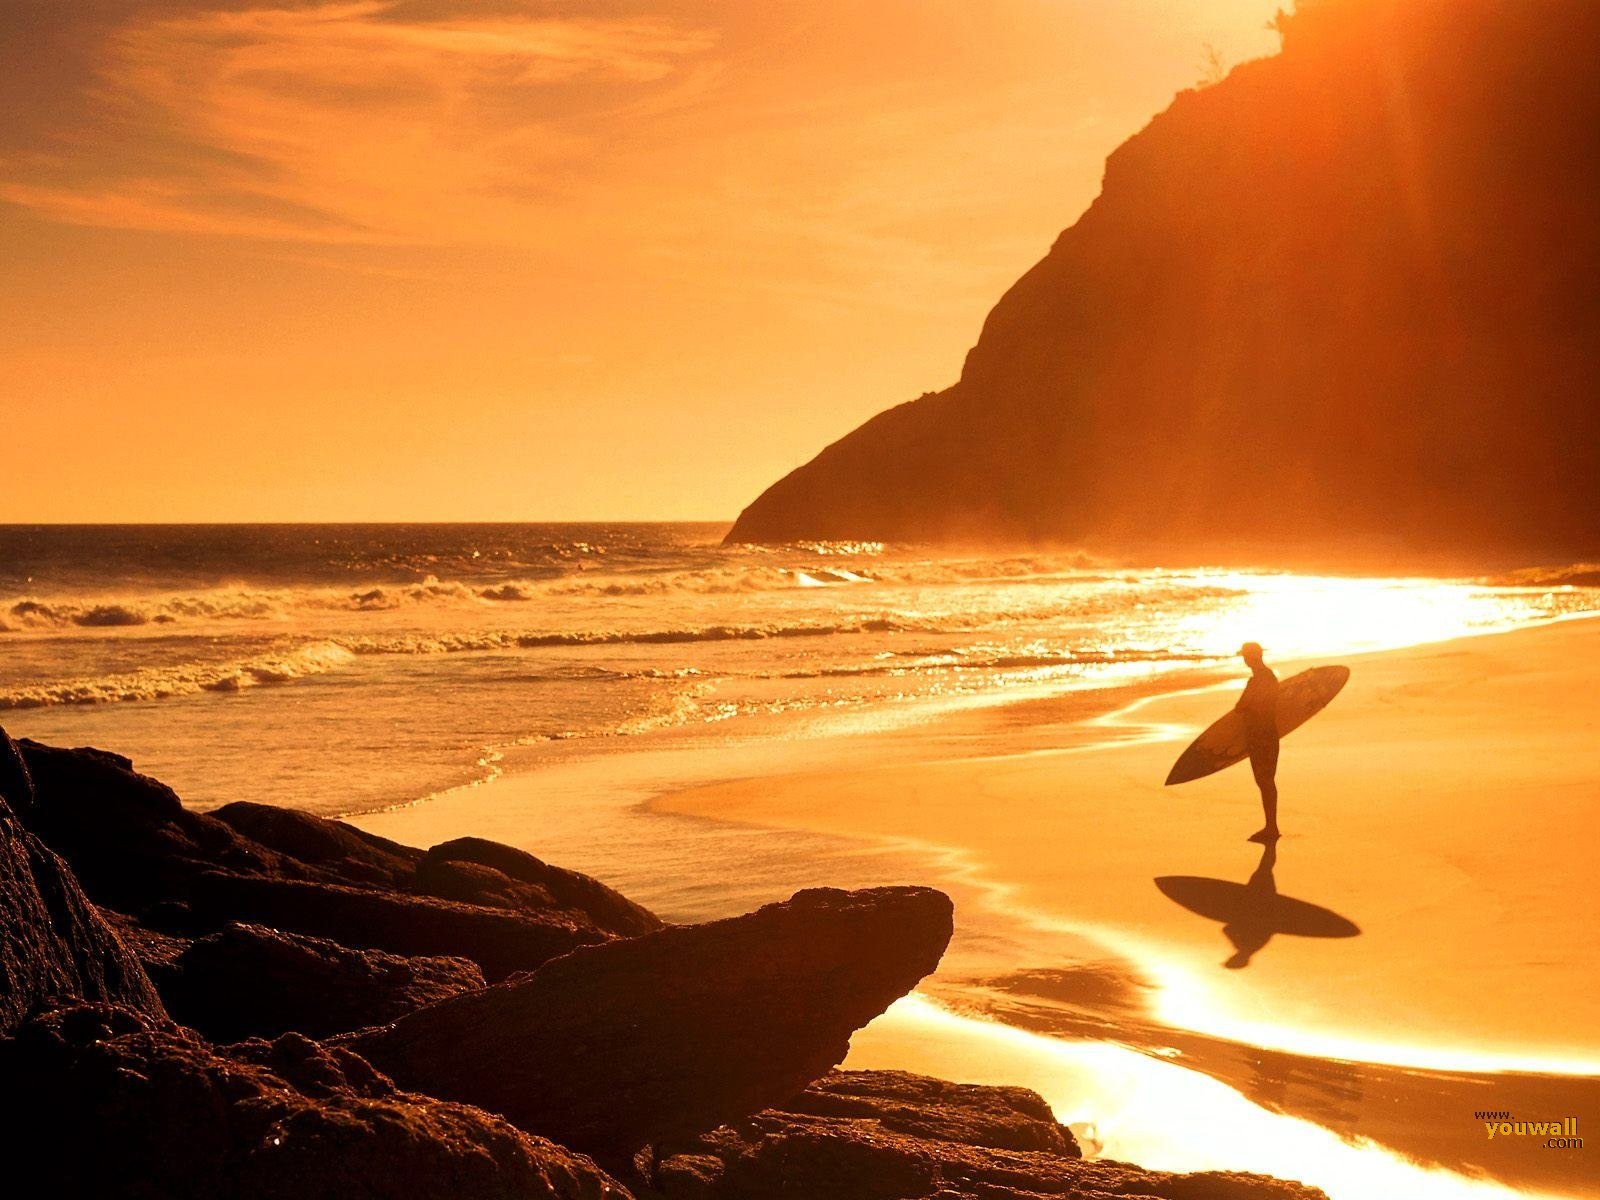 Beach Sunset Surf hd Wallpaper in high resolution for free. Get Beach ...